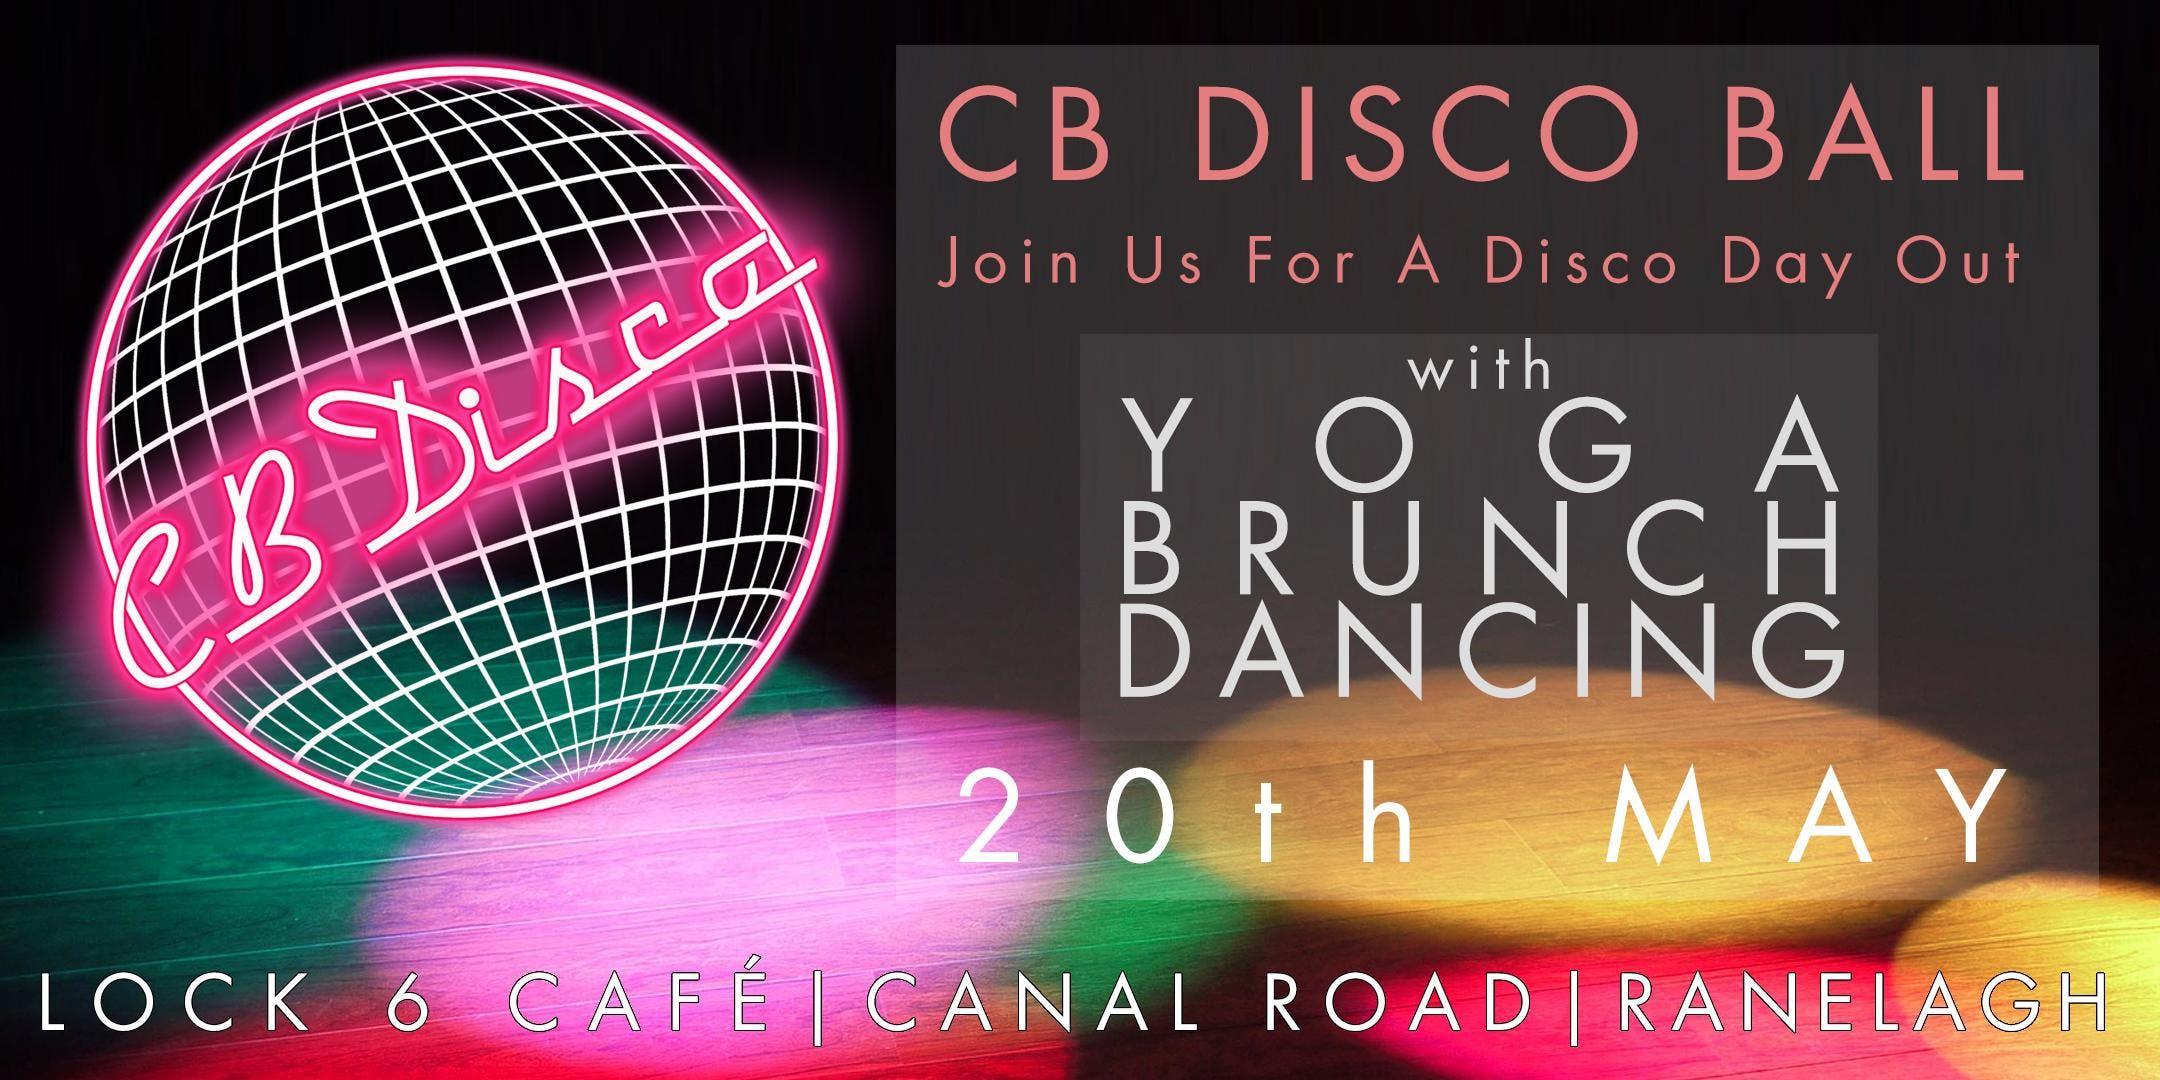 CB Disco Ball #1 : Dublin